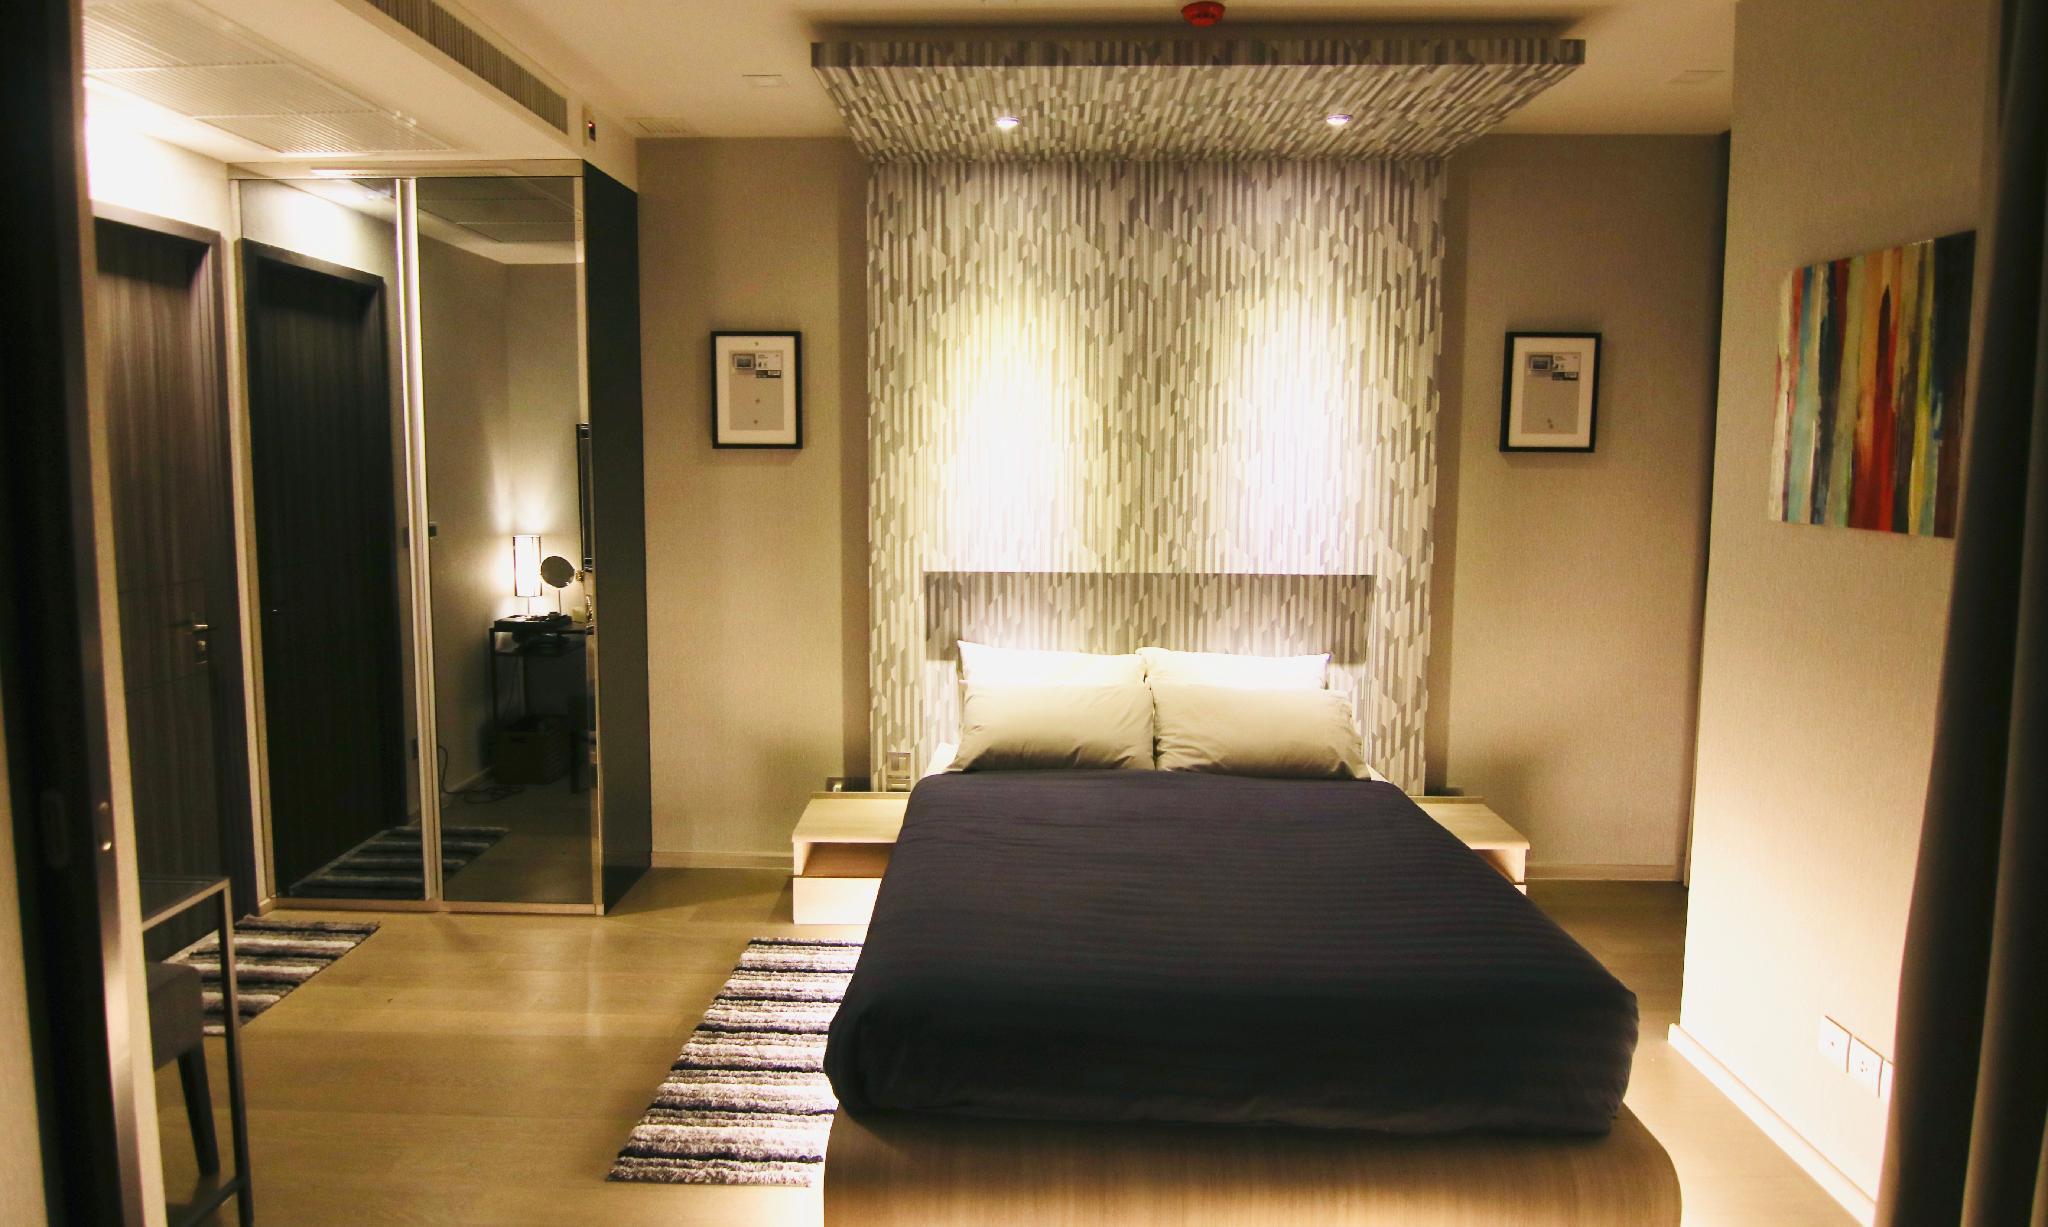 Luxurious & Romantic in the Heart of BKK#L MRT/BTS อพาร์ตเมนต์ 1 ห้องนอน 1 ห้องน้ำส่วนตัว ขนาด 35 ตร.ม. – สุขุมวิท